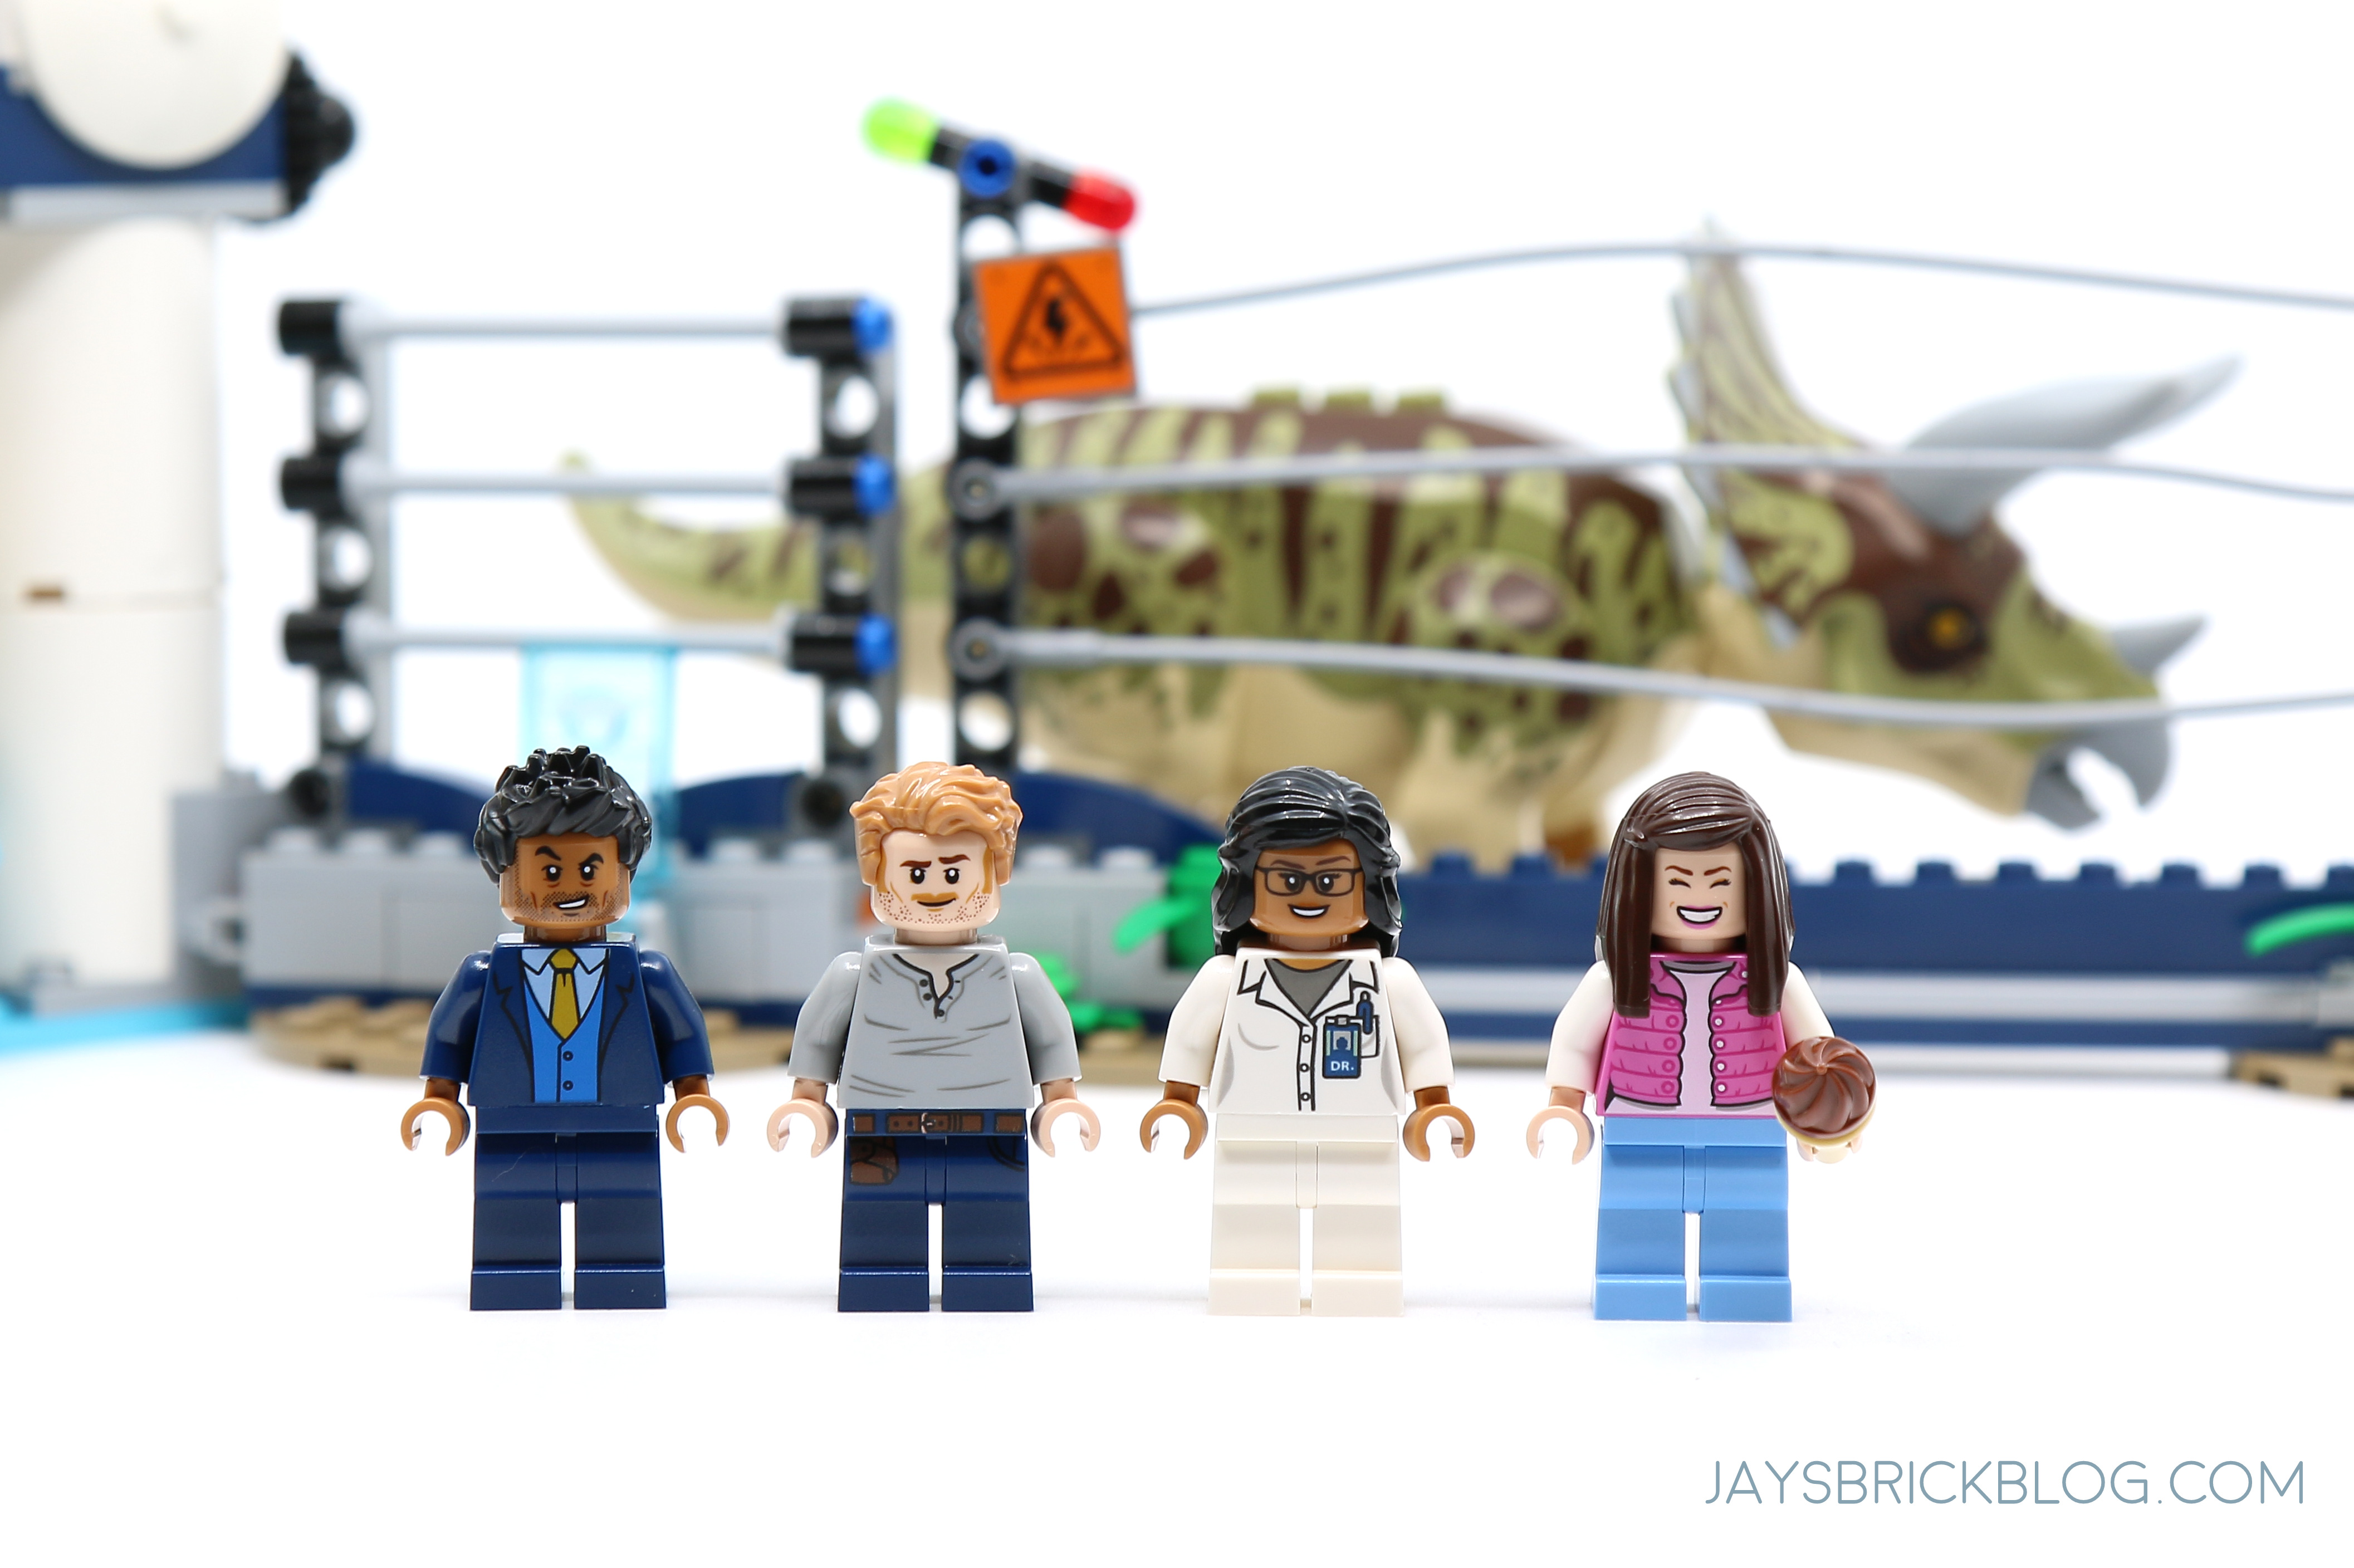 Lego 75937 Jurassic World Tourist Minifigure